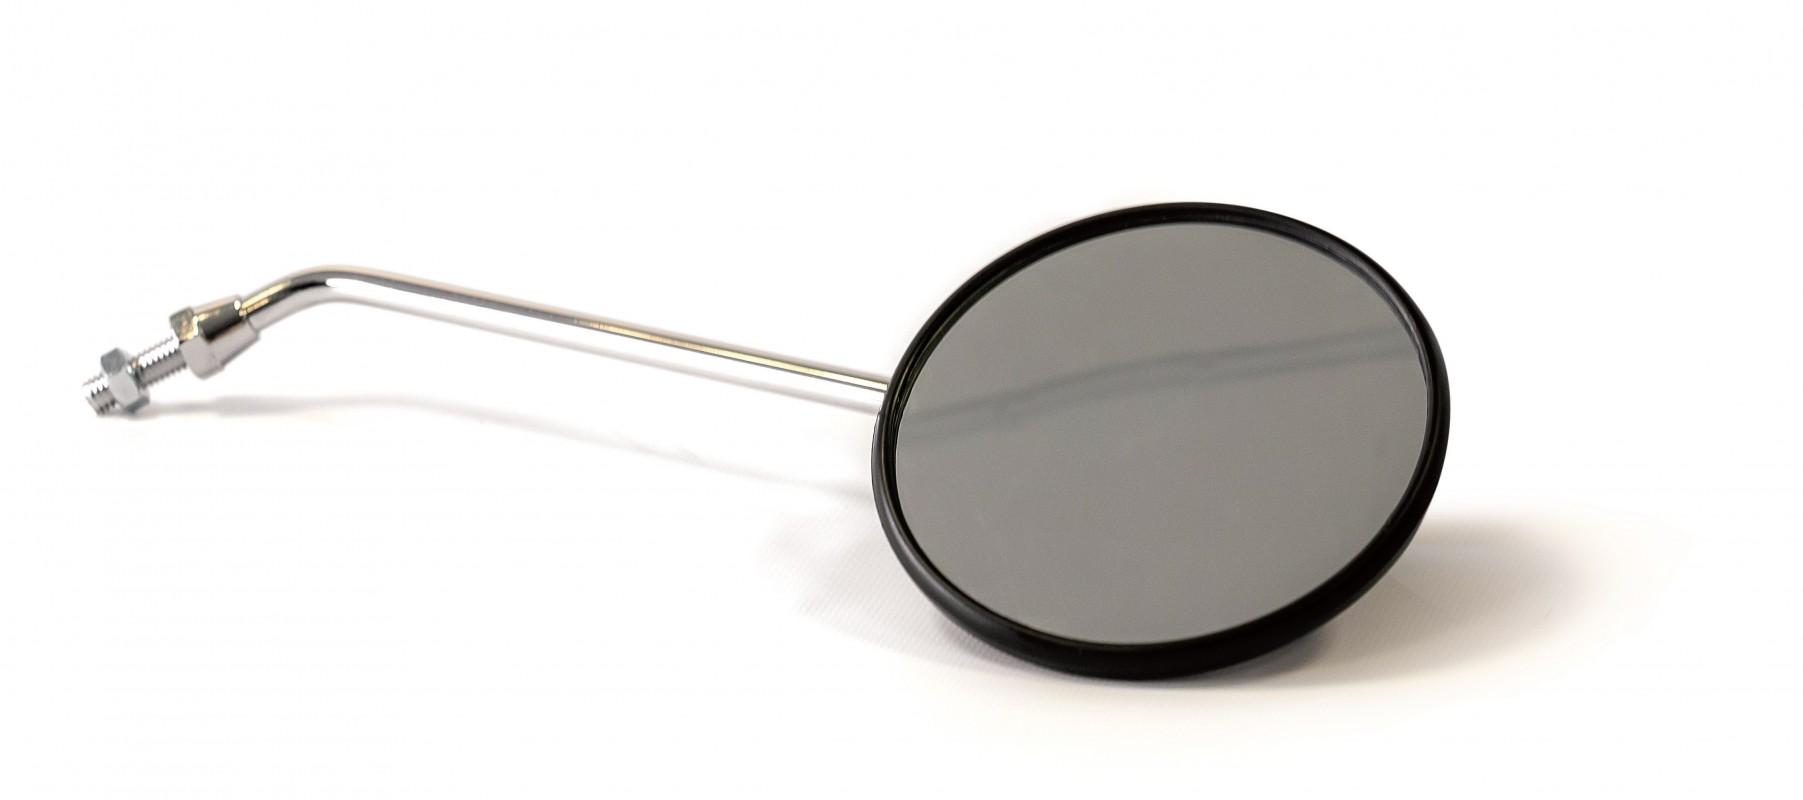 Nano / Comfort mirror